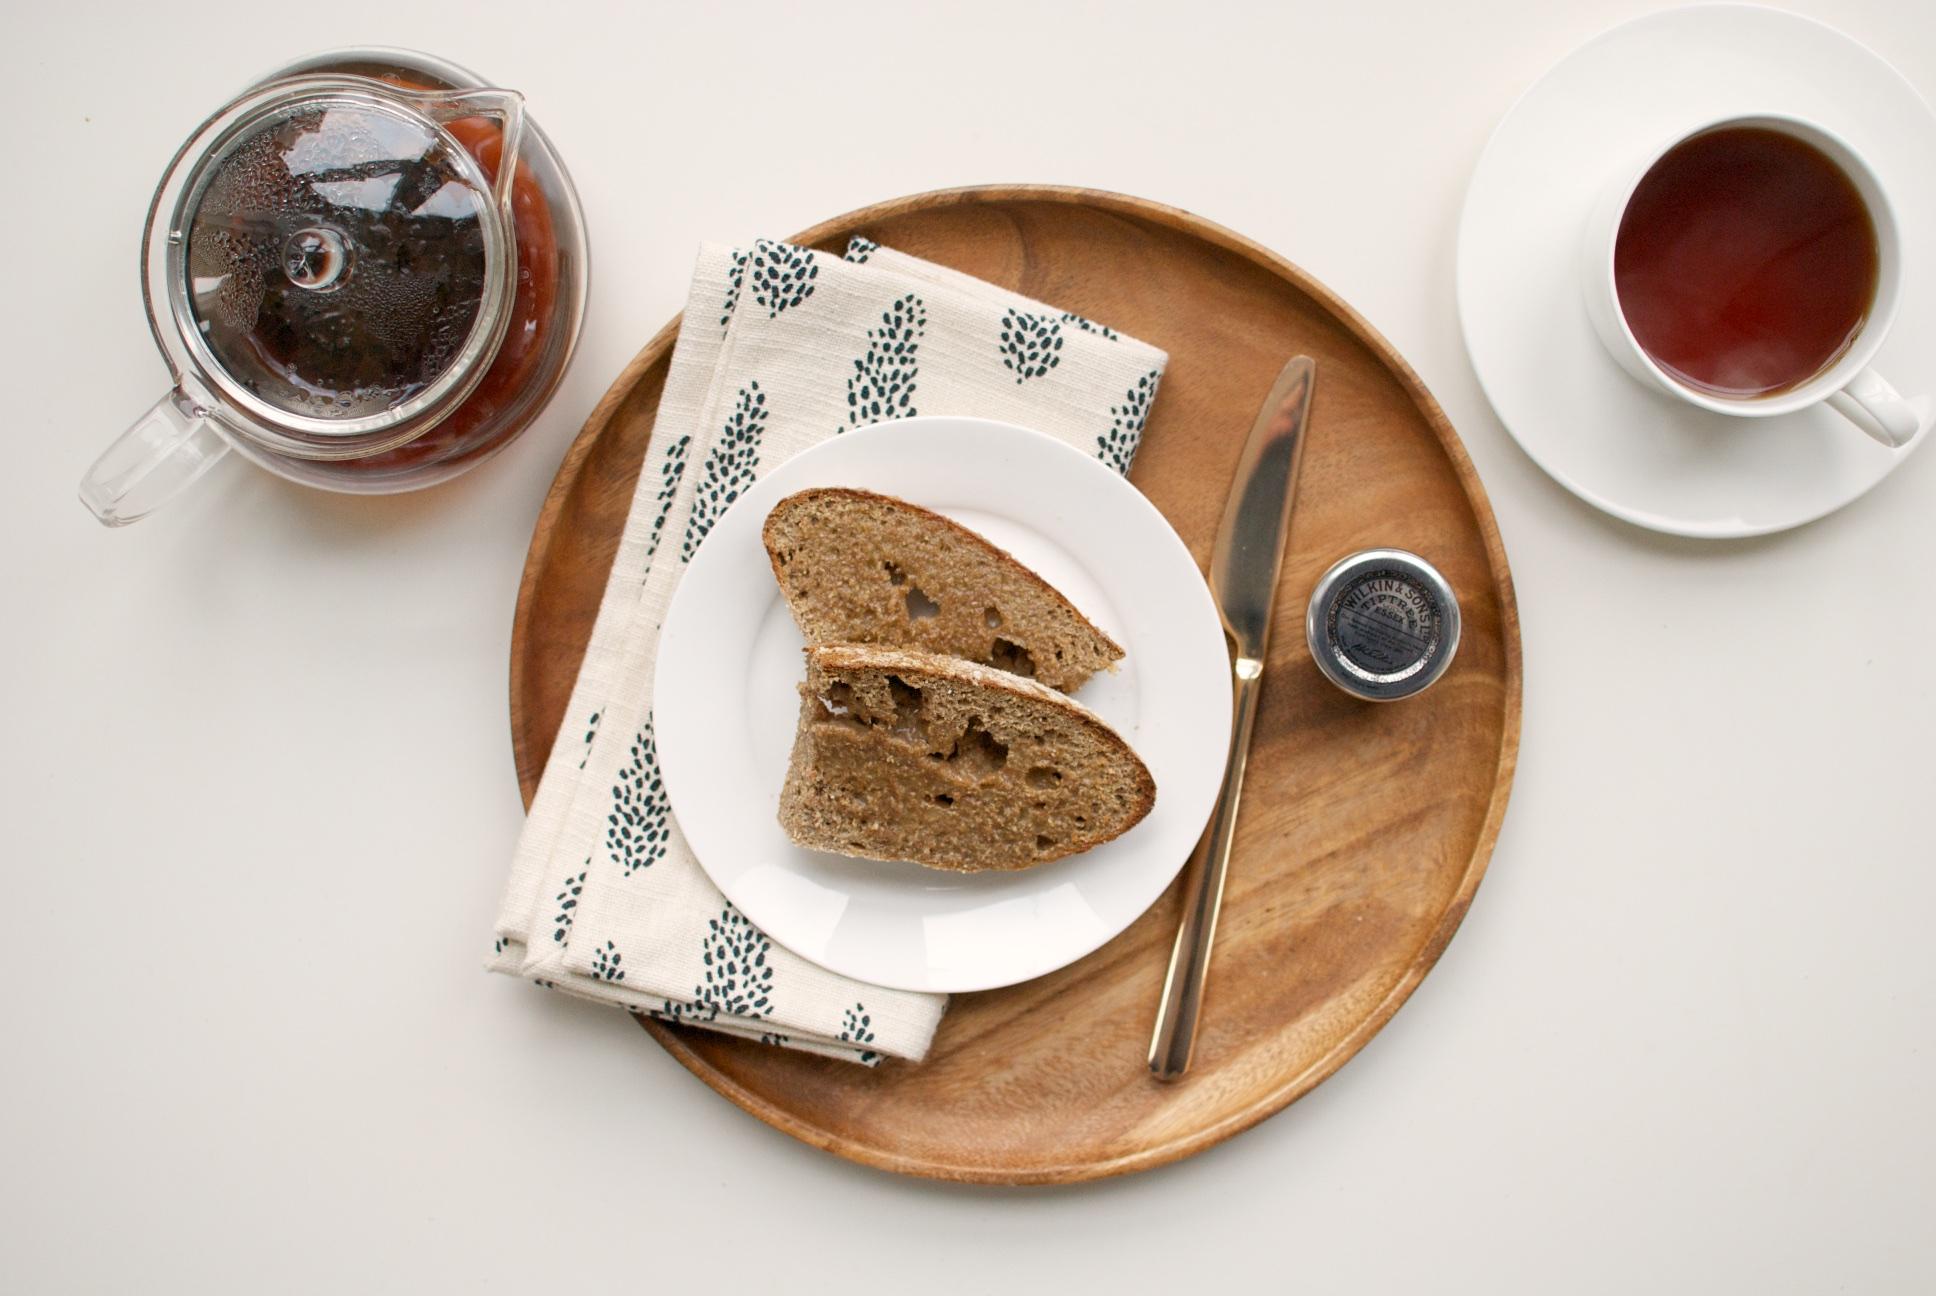 vday breakfast 8.jpg